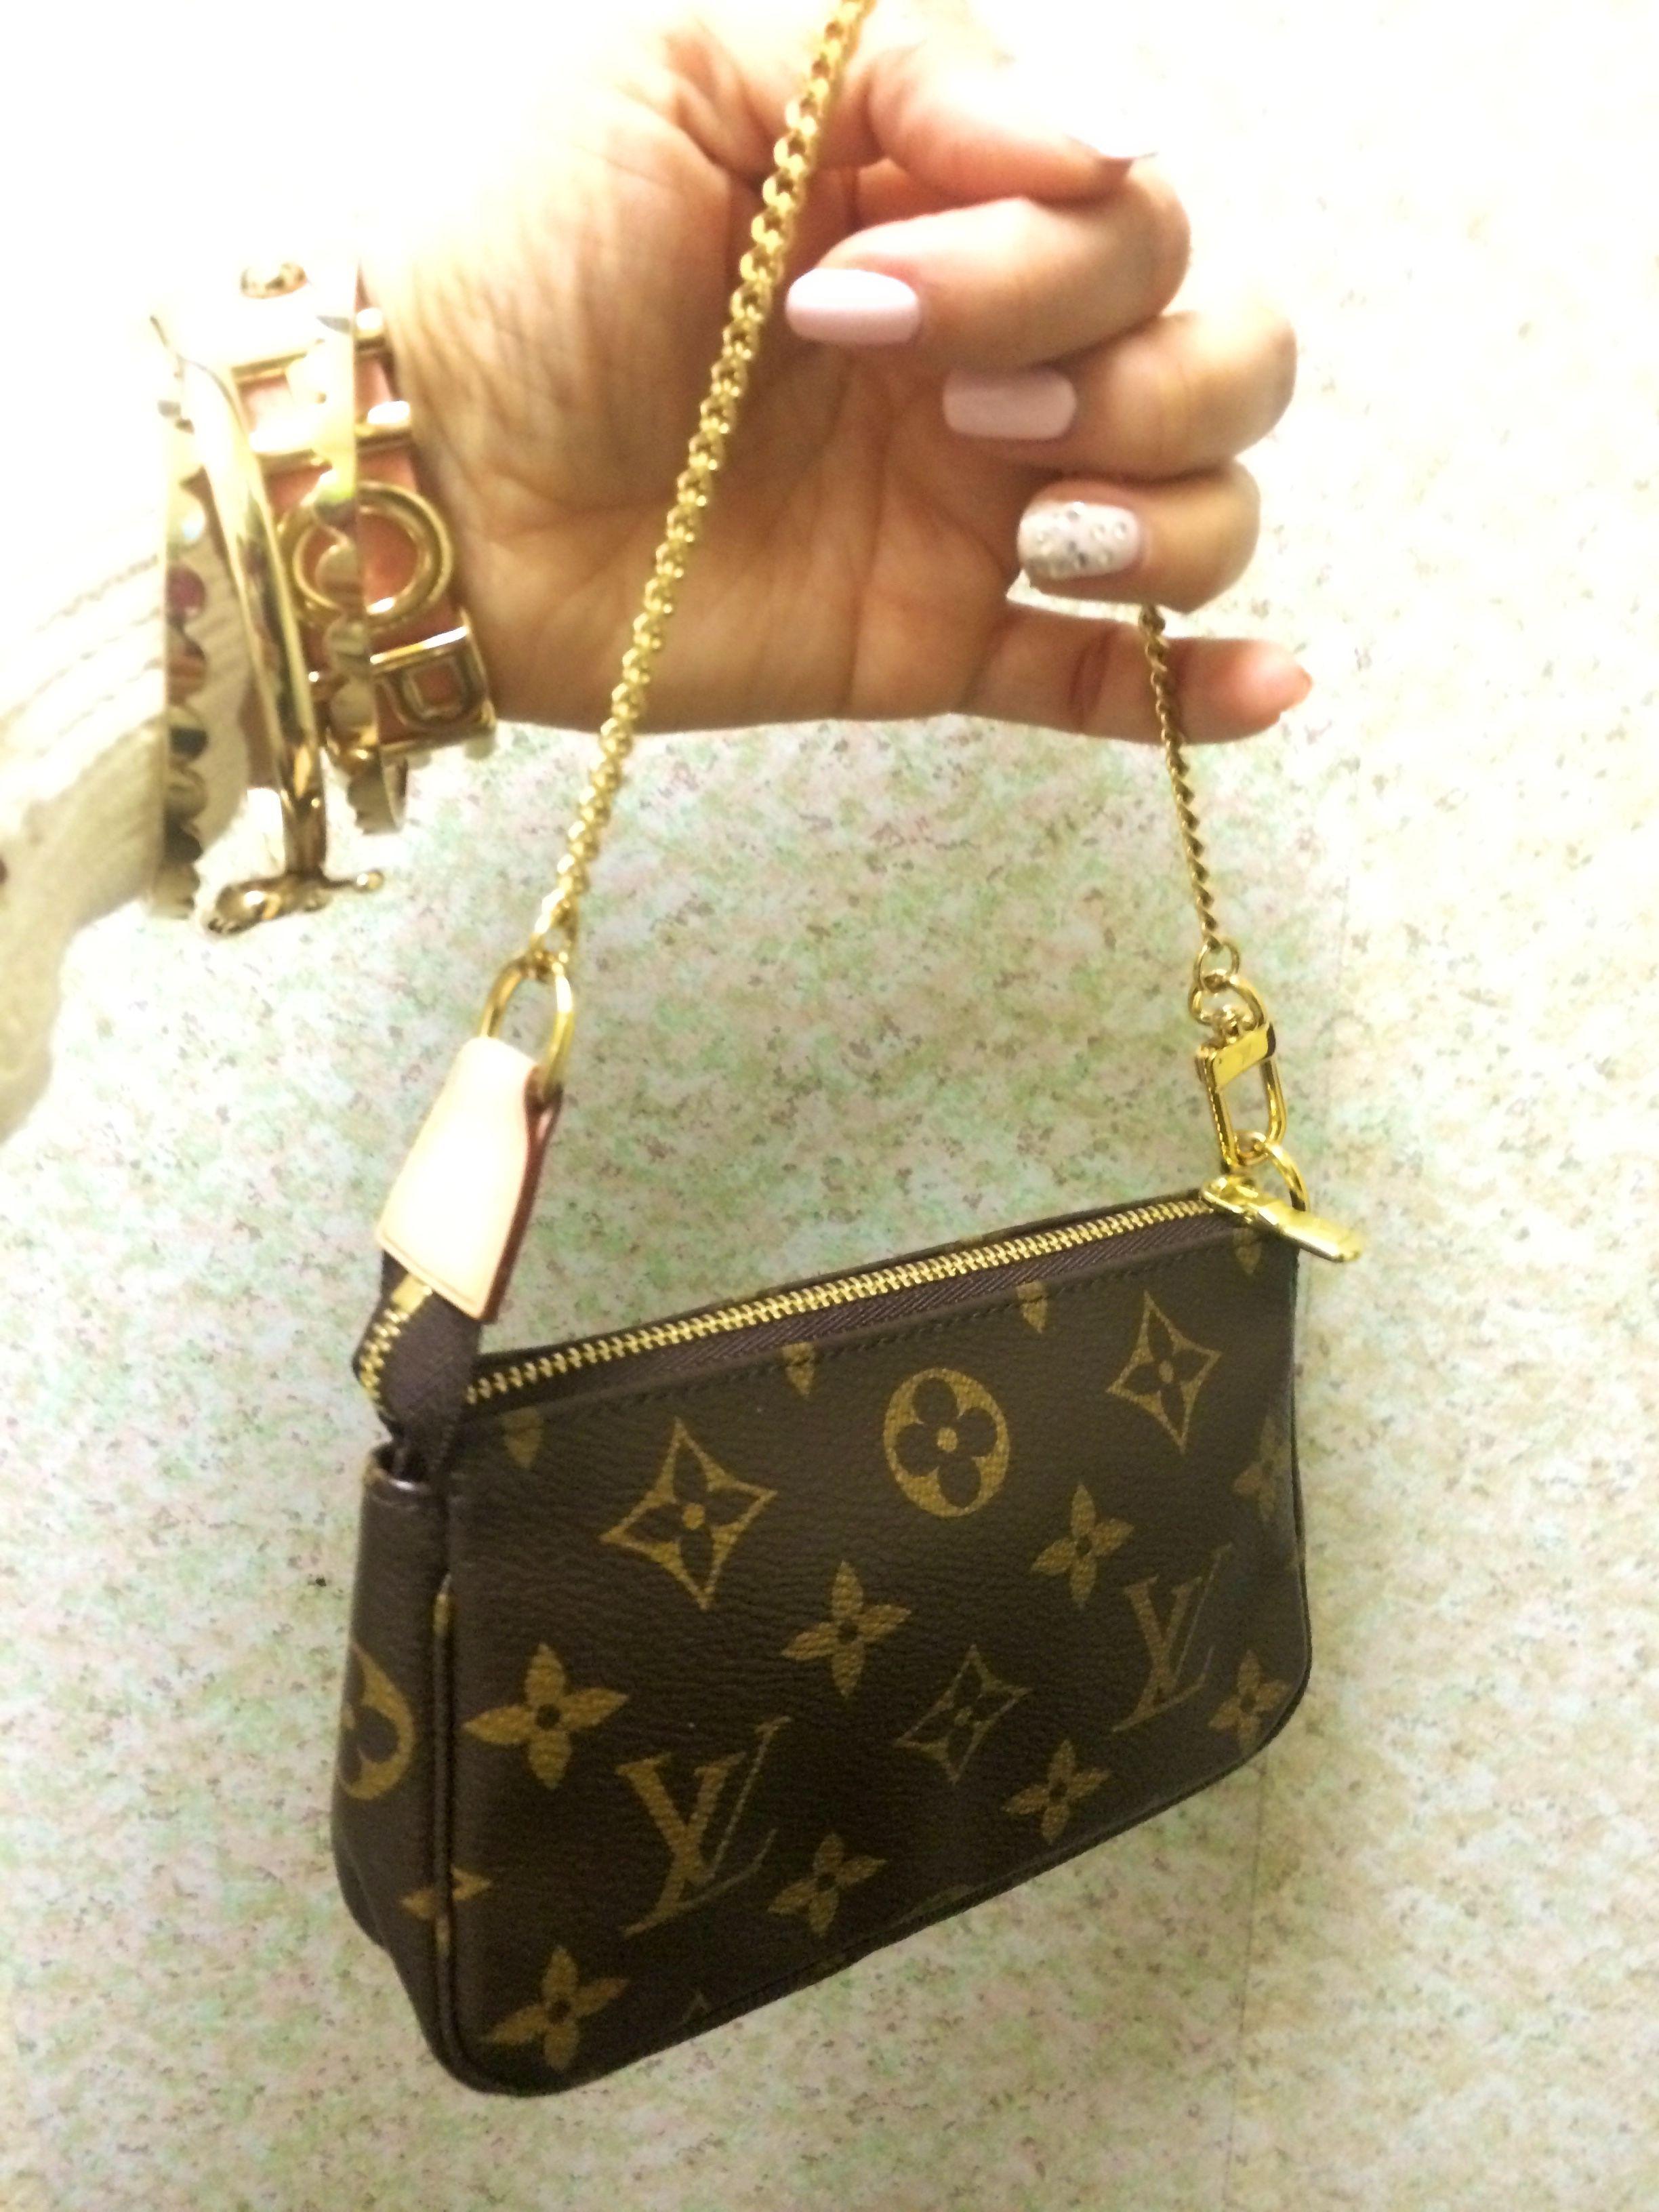 895cd17edd45 Louis Vuitton Mini Pochette